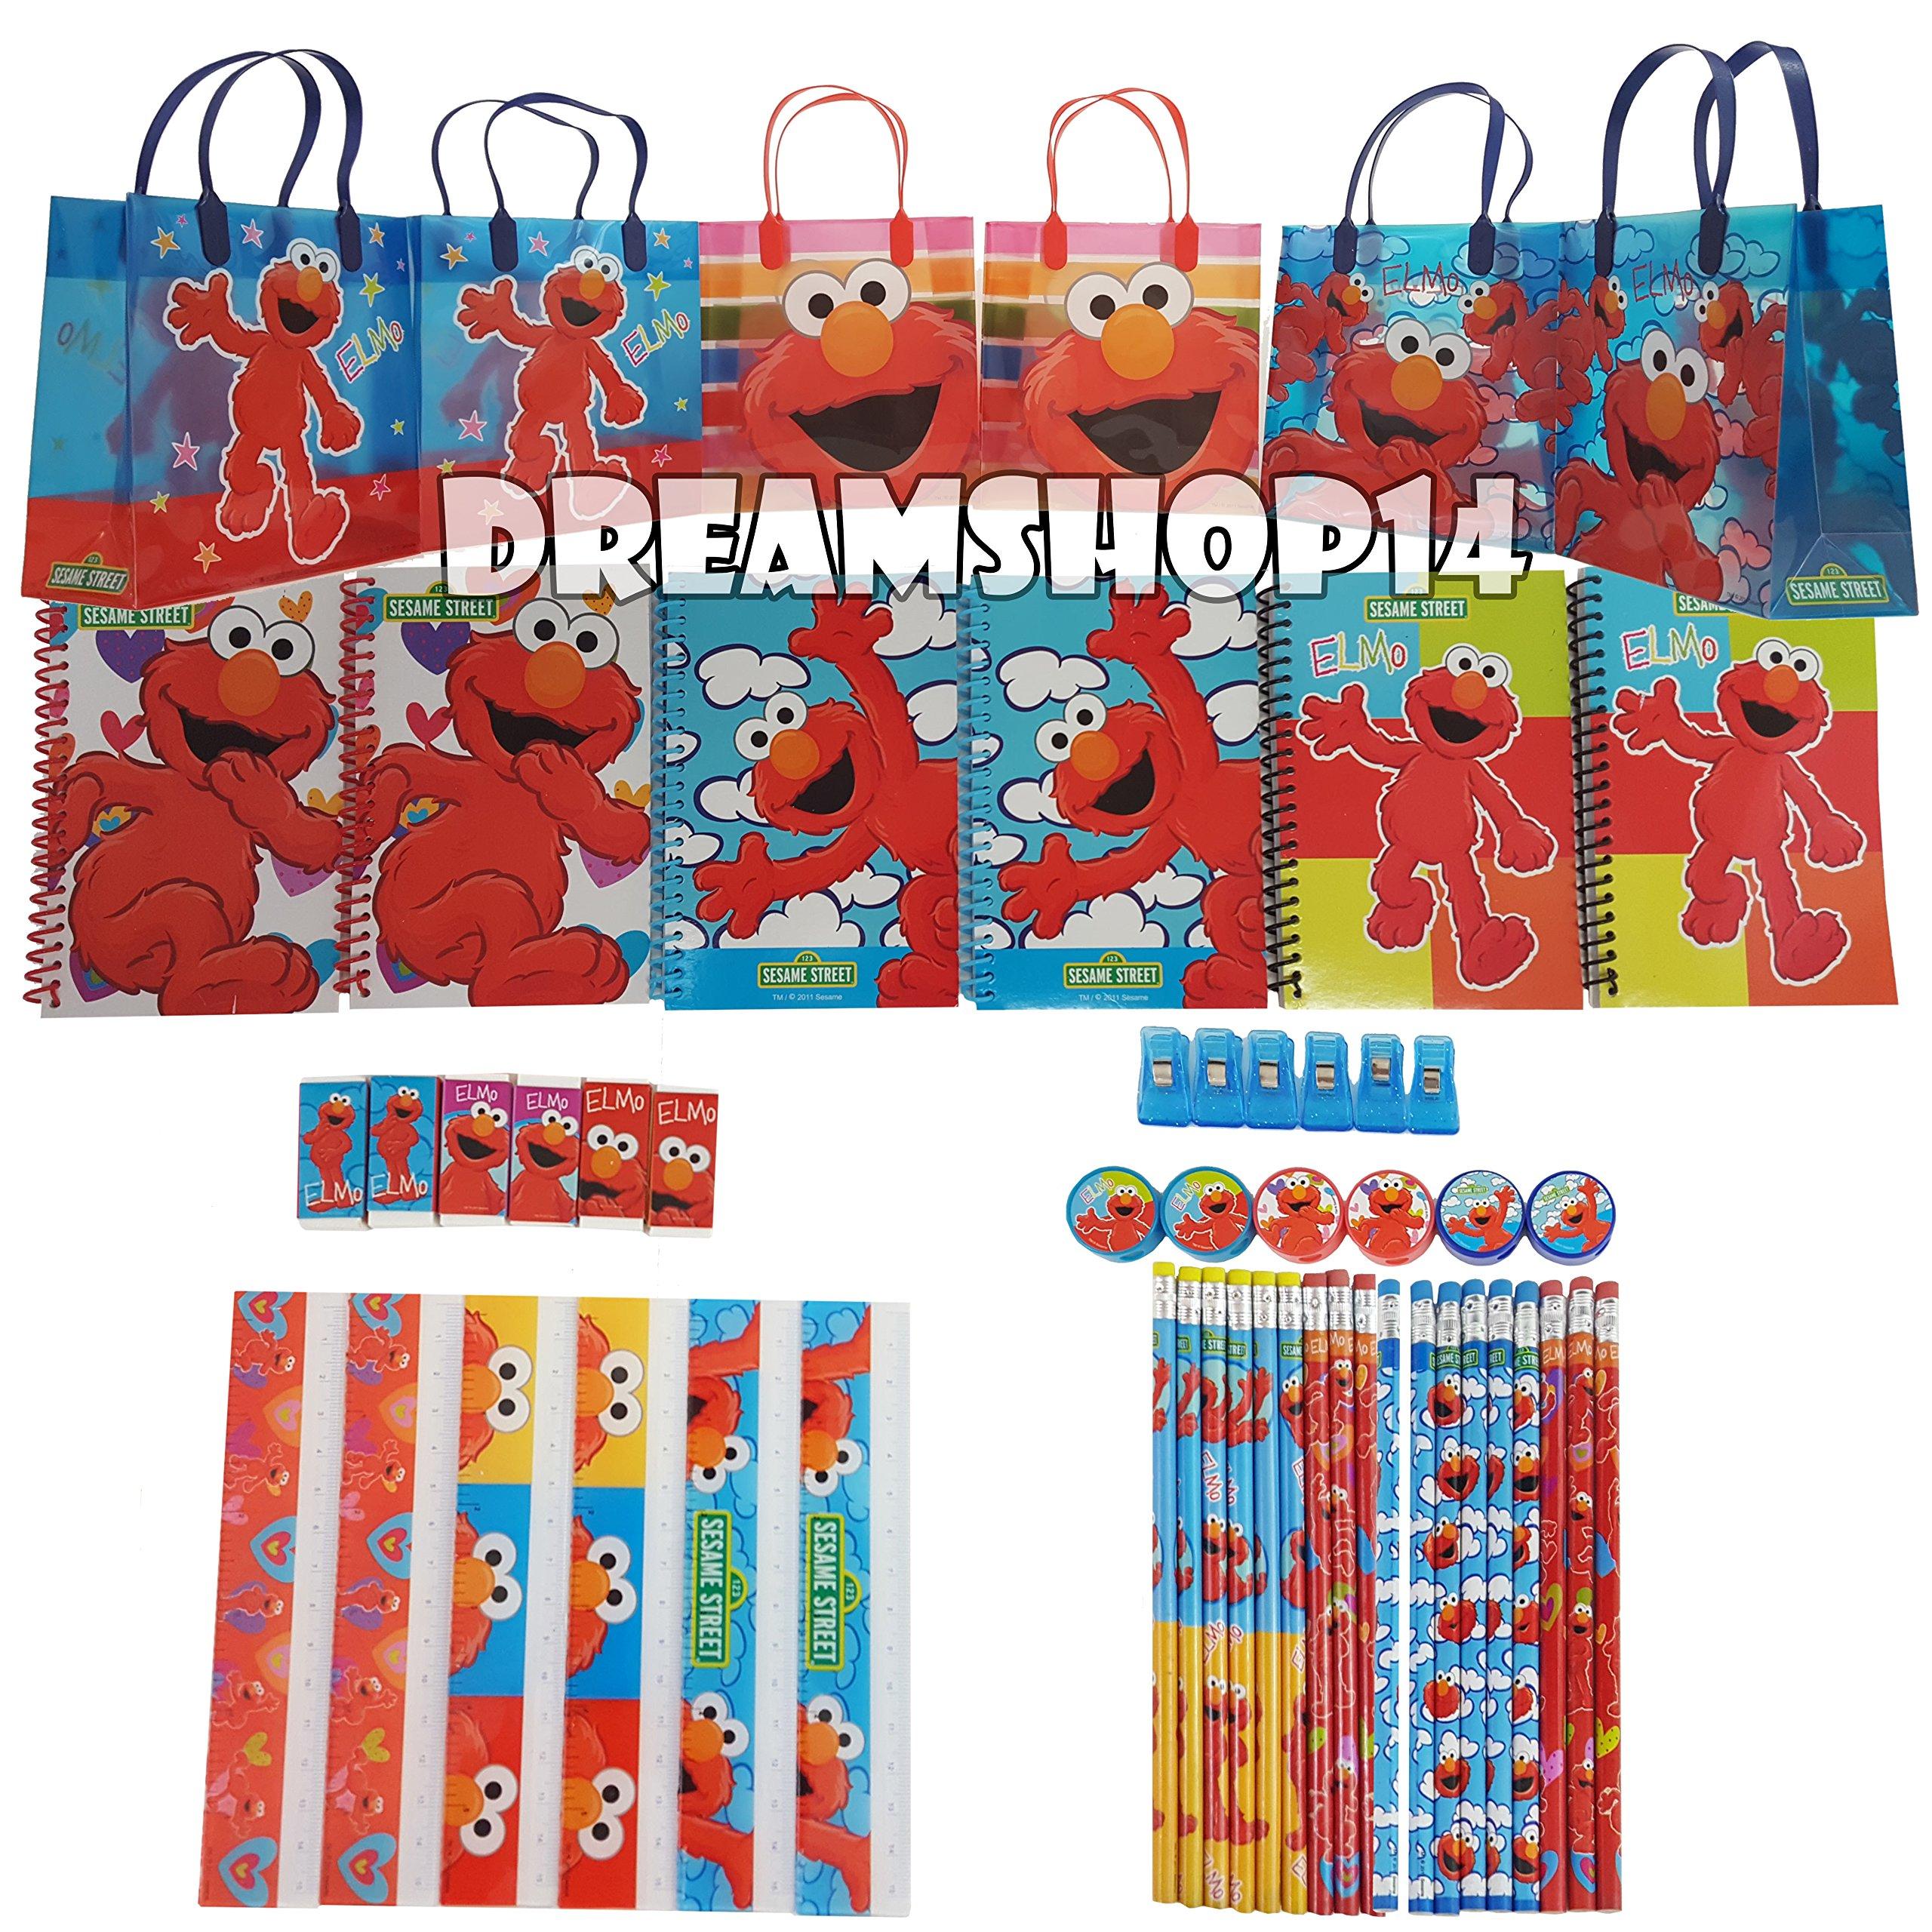 Sesame Street Elmo Party Favor Stationery Set - 6 Pack (54 Pcs) Medium Sized Bag by Dreamshop14